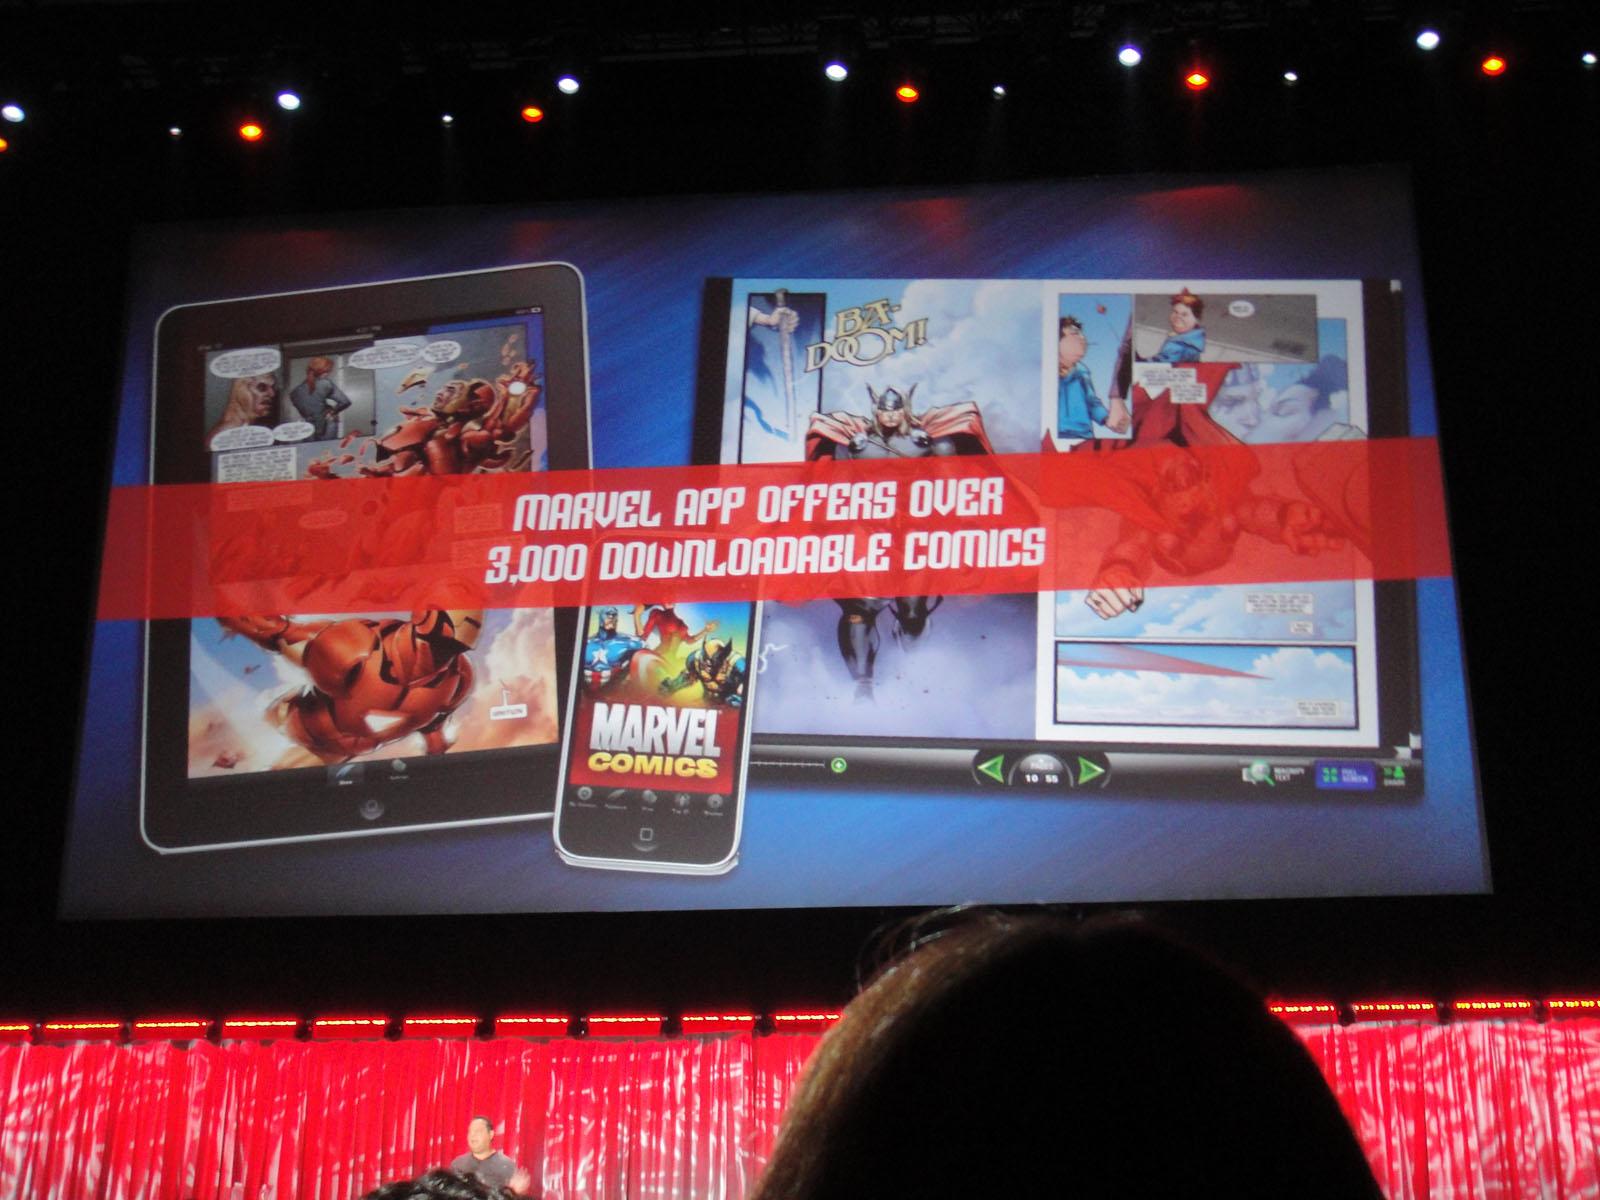 File:D23 Expo 2011 - Marvel panel - digital comics